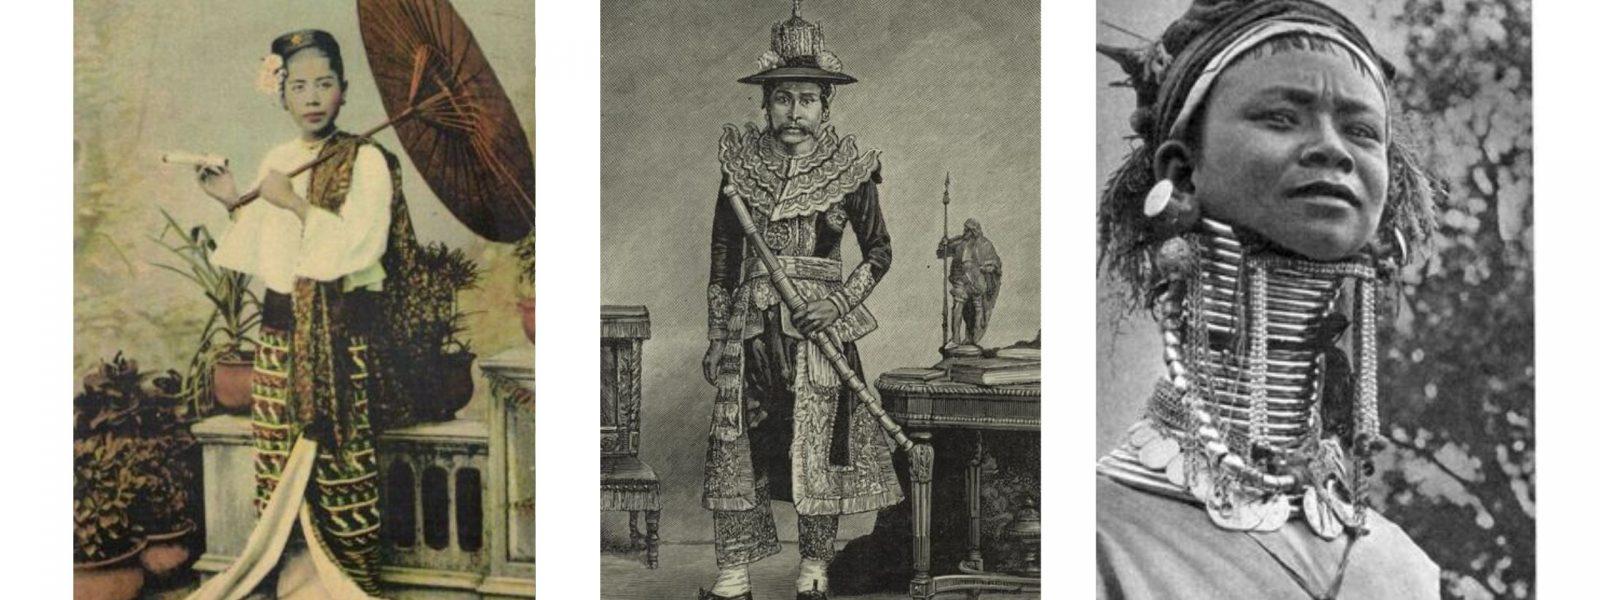 History - old pictures of Myanmar people - Sampan Travel